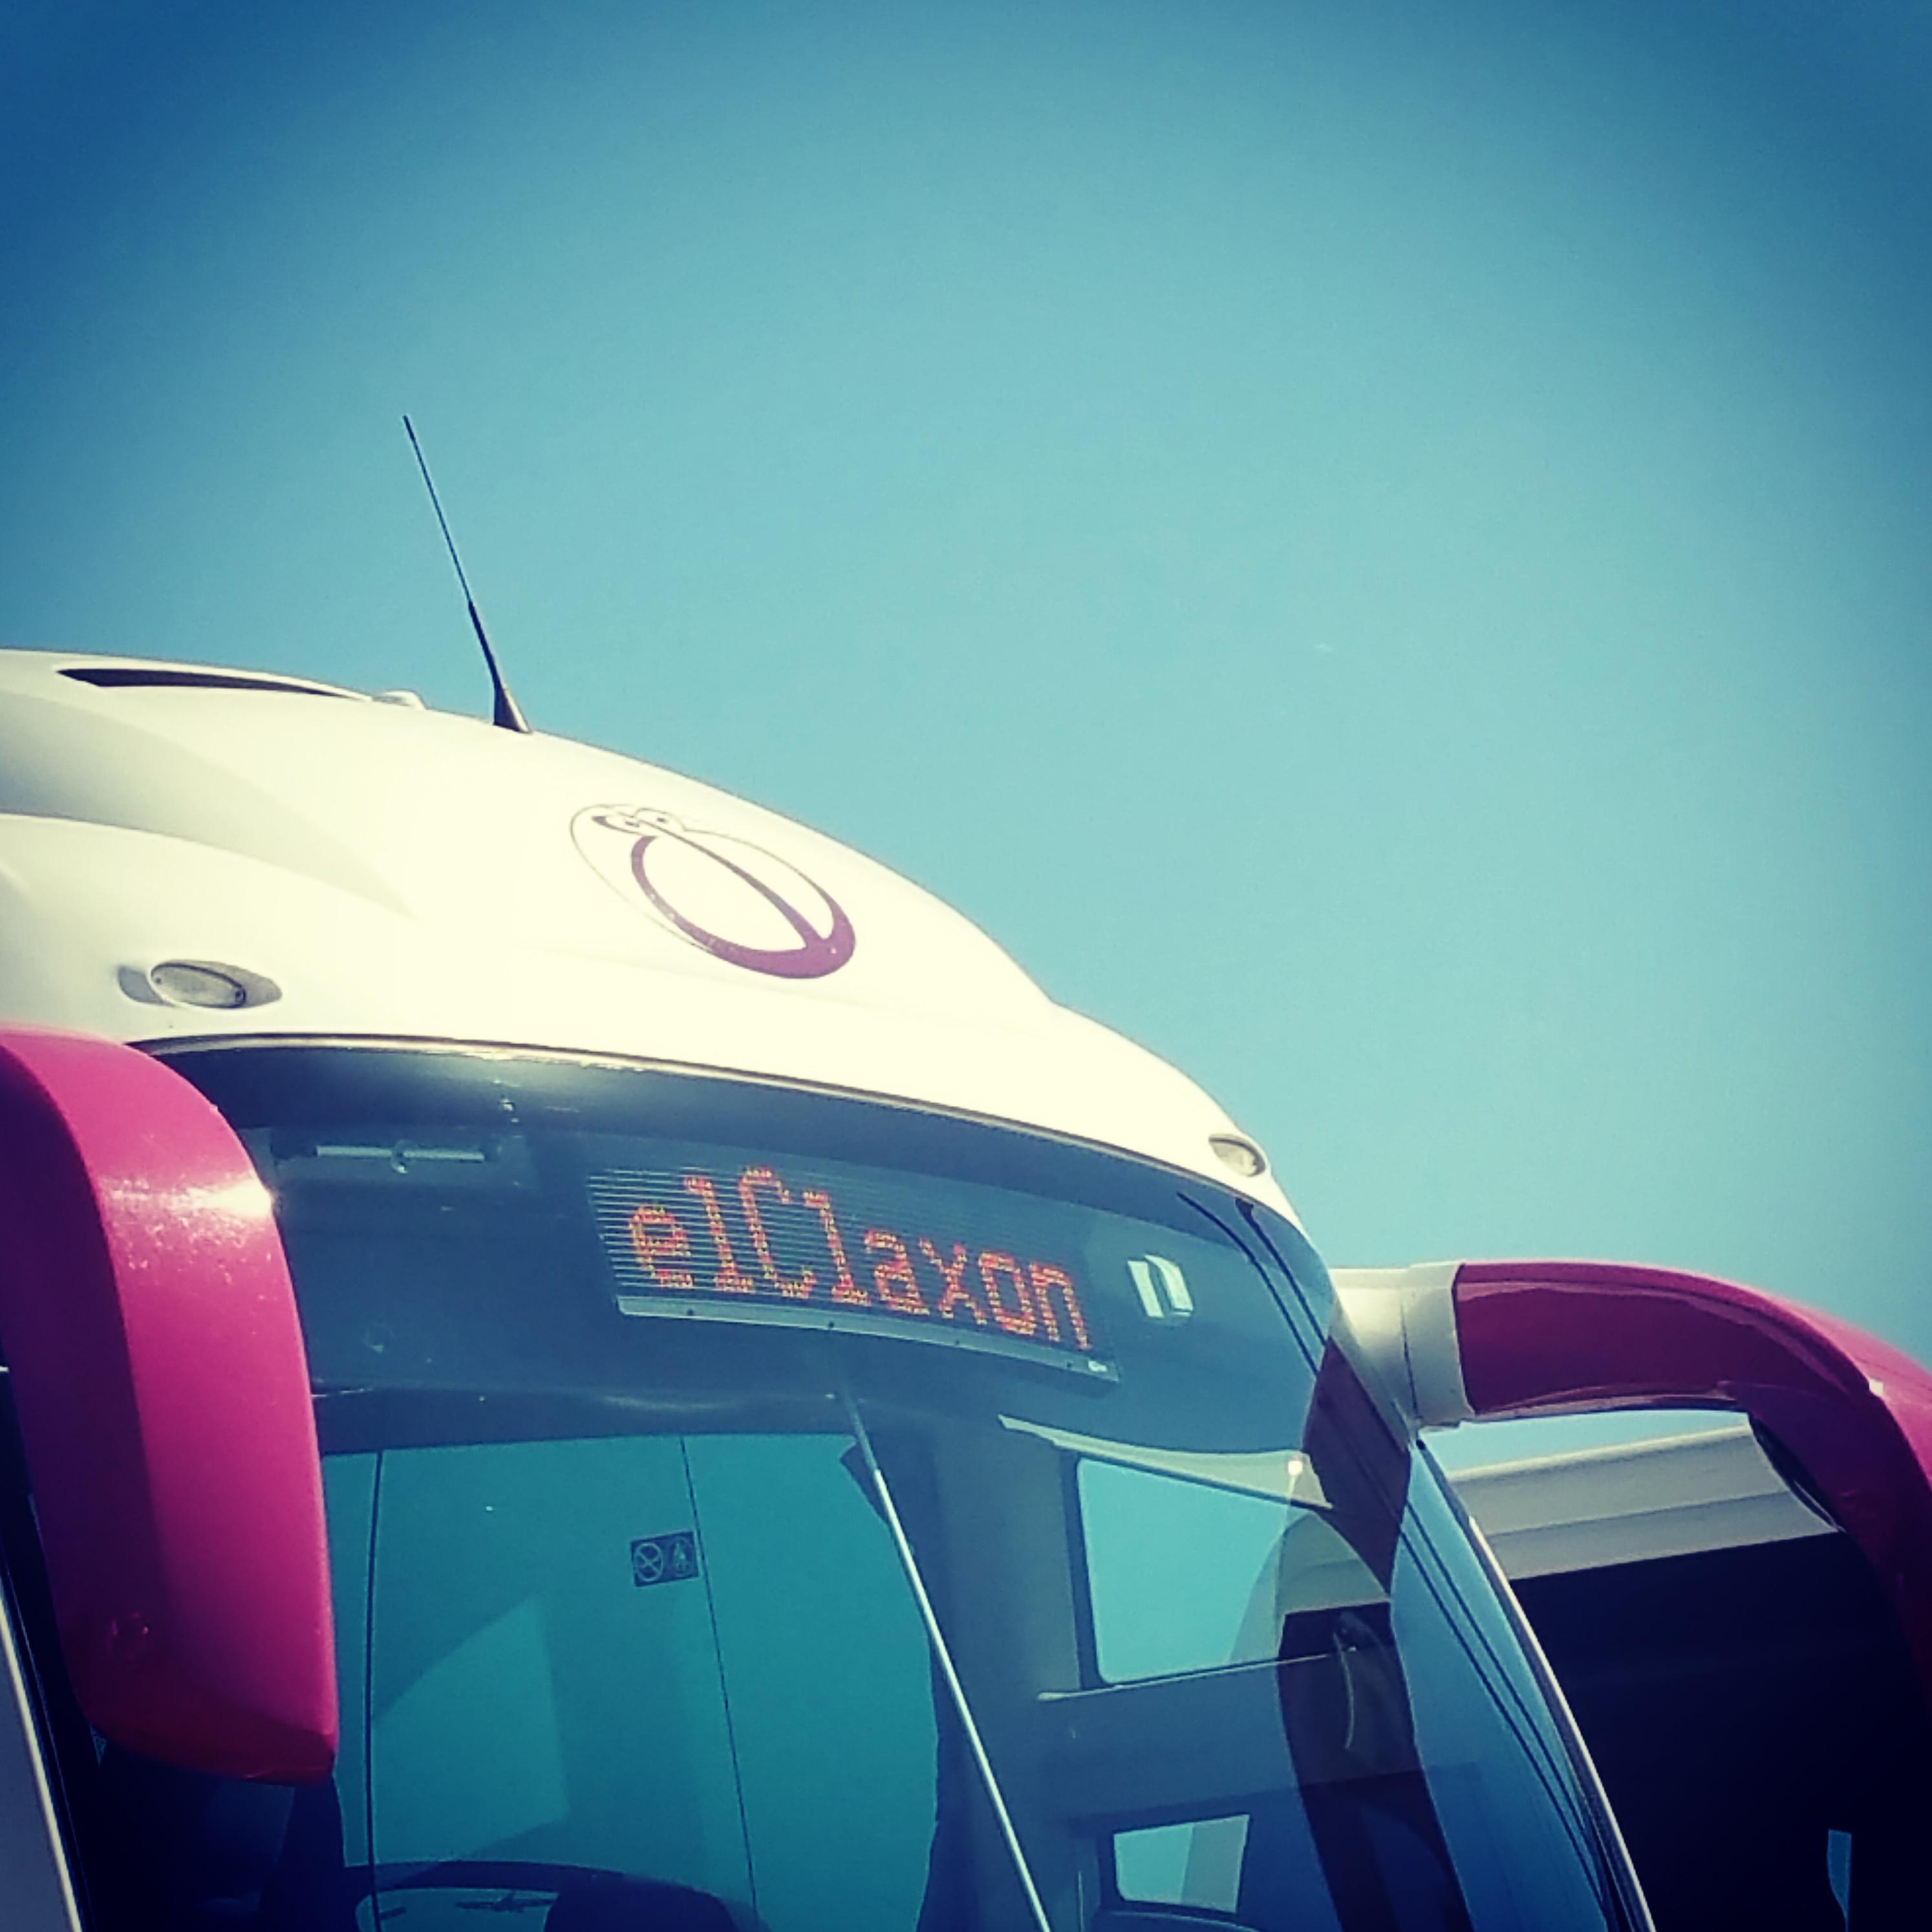 elClaxon exterior alquiler autocar irizar i6 barcelona